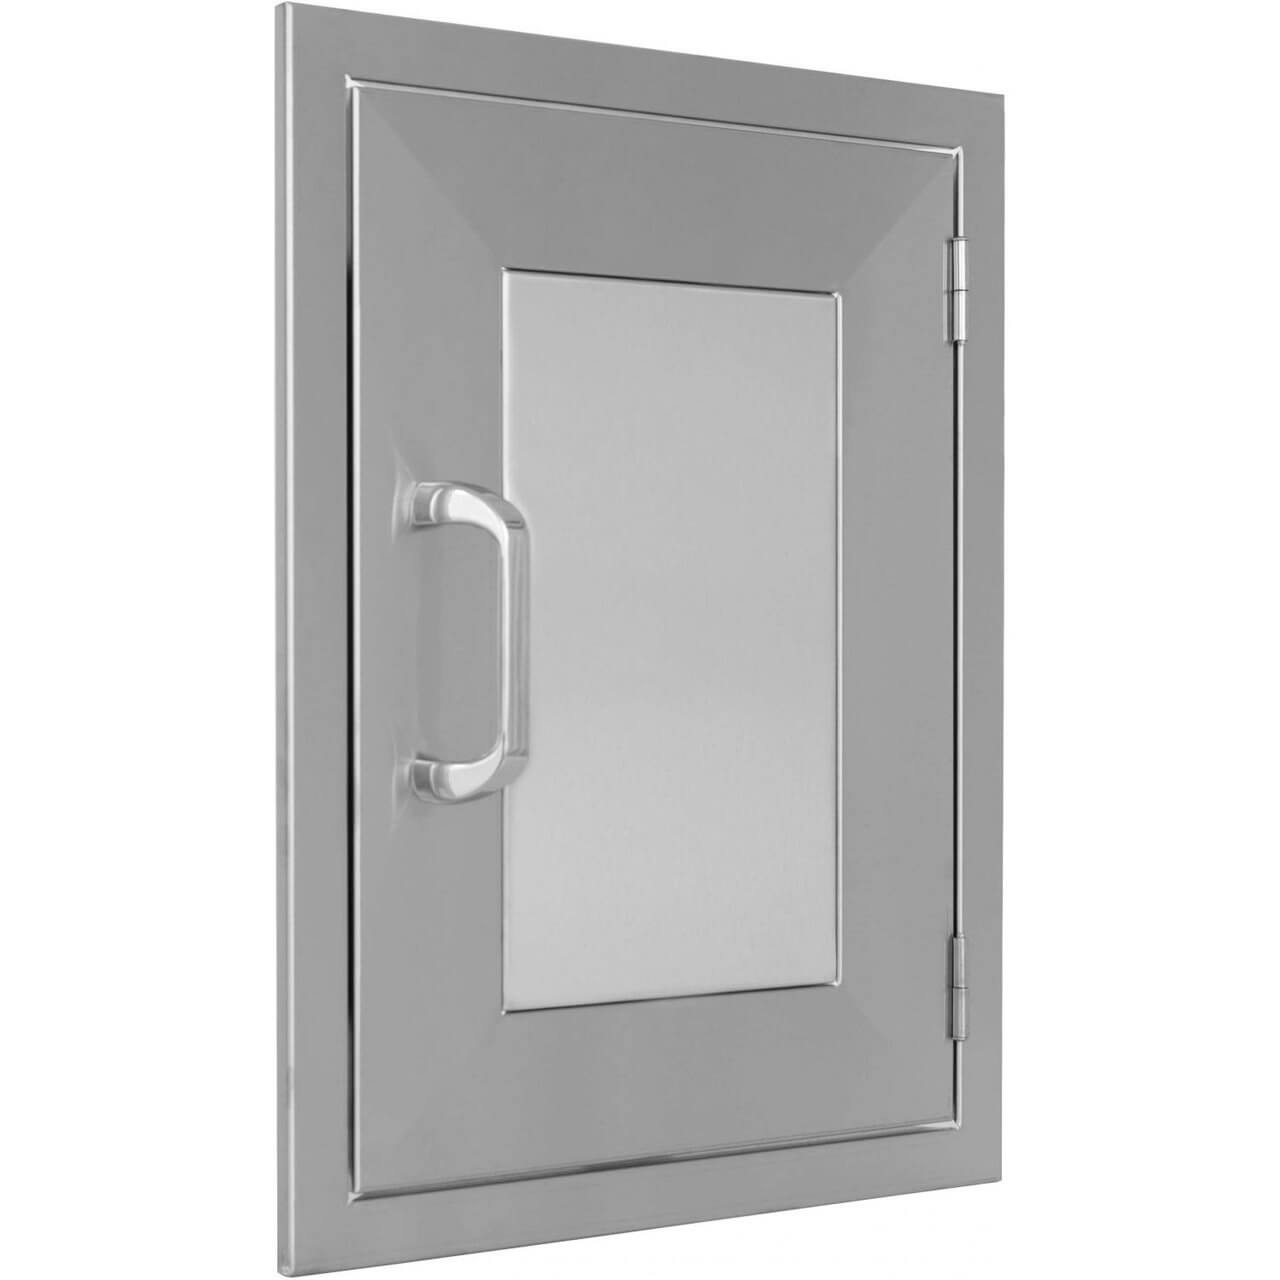 Denali series 14 20 single access vertical door bbq for Acces vertical